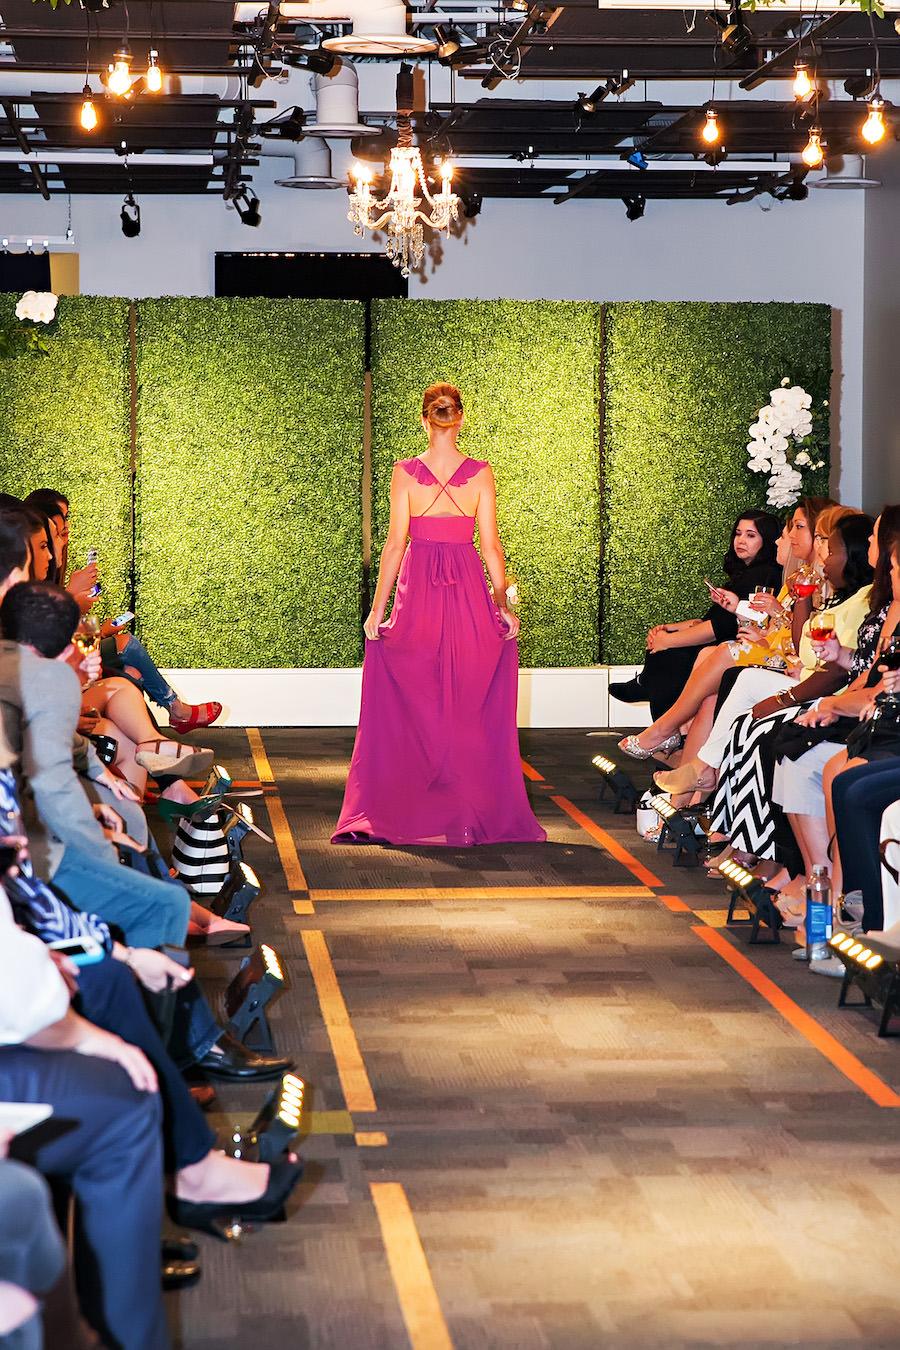 Bright Pink Magenta Bridesmaid Dress | Marry Me Tampa Bay Wedding Week Bridal Fashion Runway Show | Tampa Bay Wedding Photographer Limelight Photography | Wedding Planner Glitz Events | Hair and Makeup Artist Michele Renee The Studio